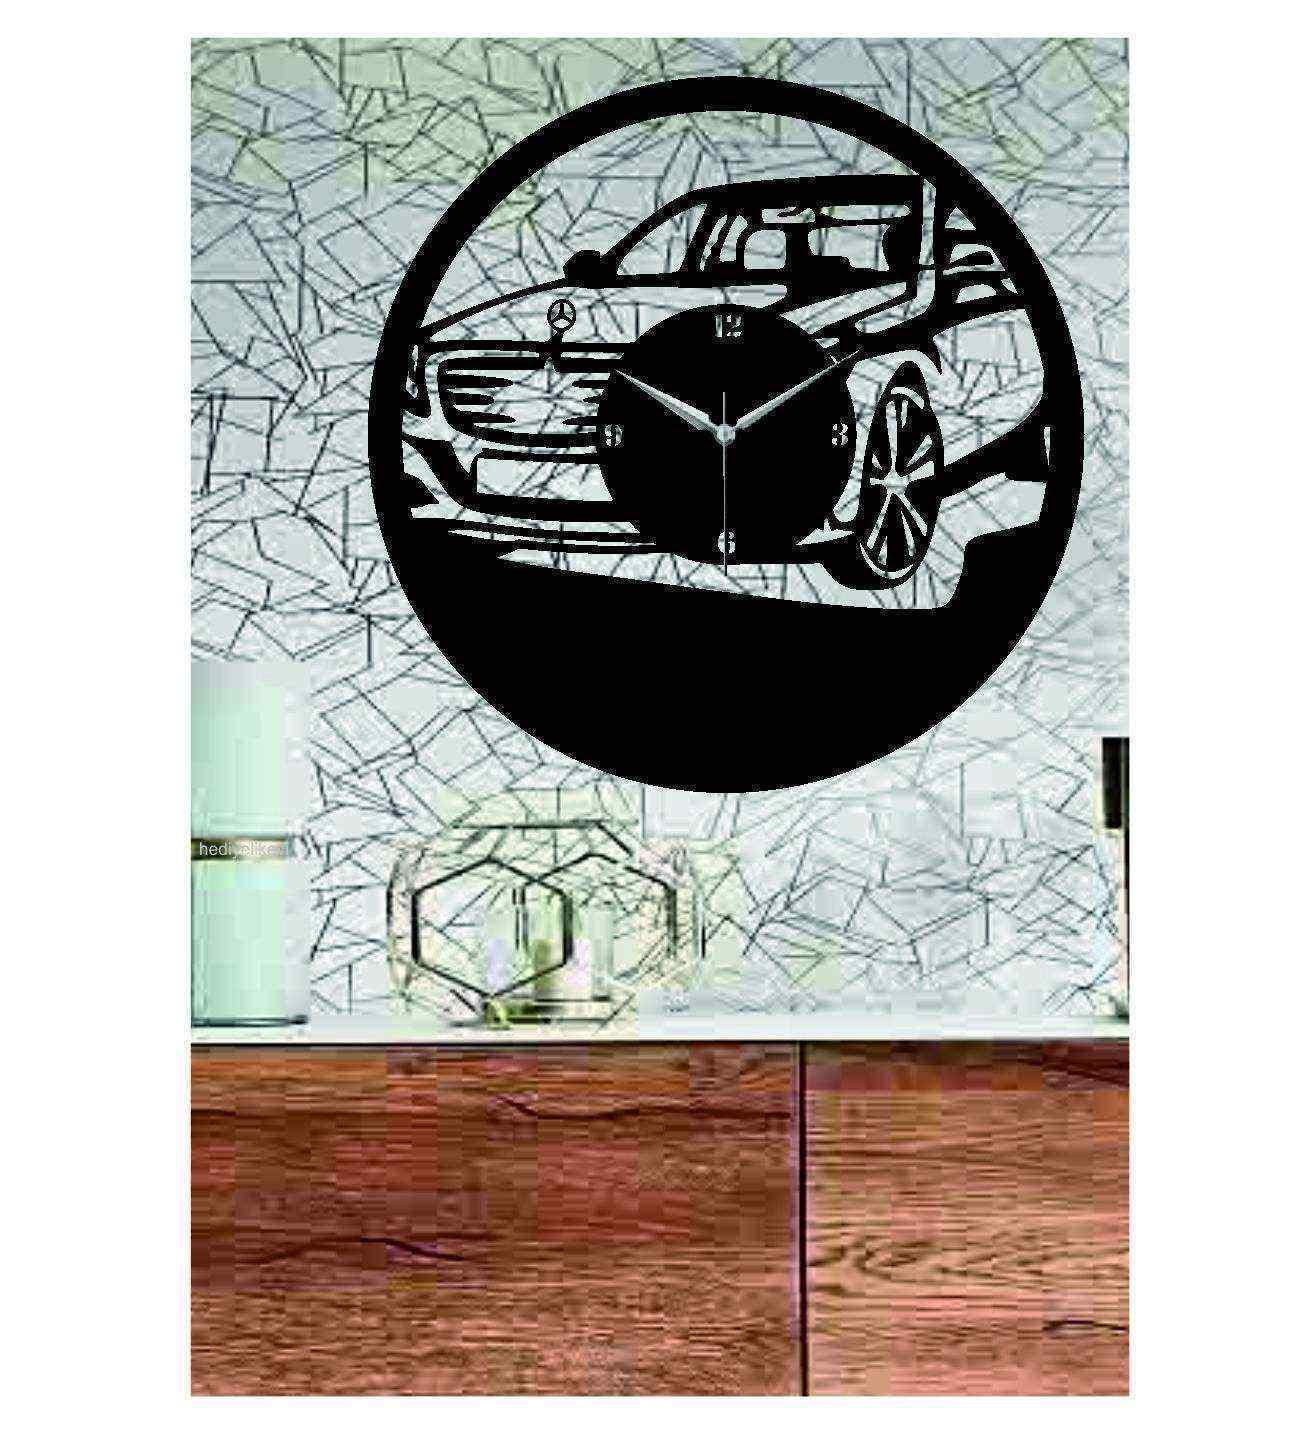 Mercedes-Benz Temalı Ahşap Duvar Saati